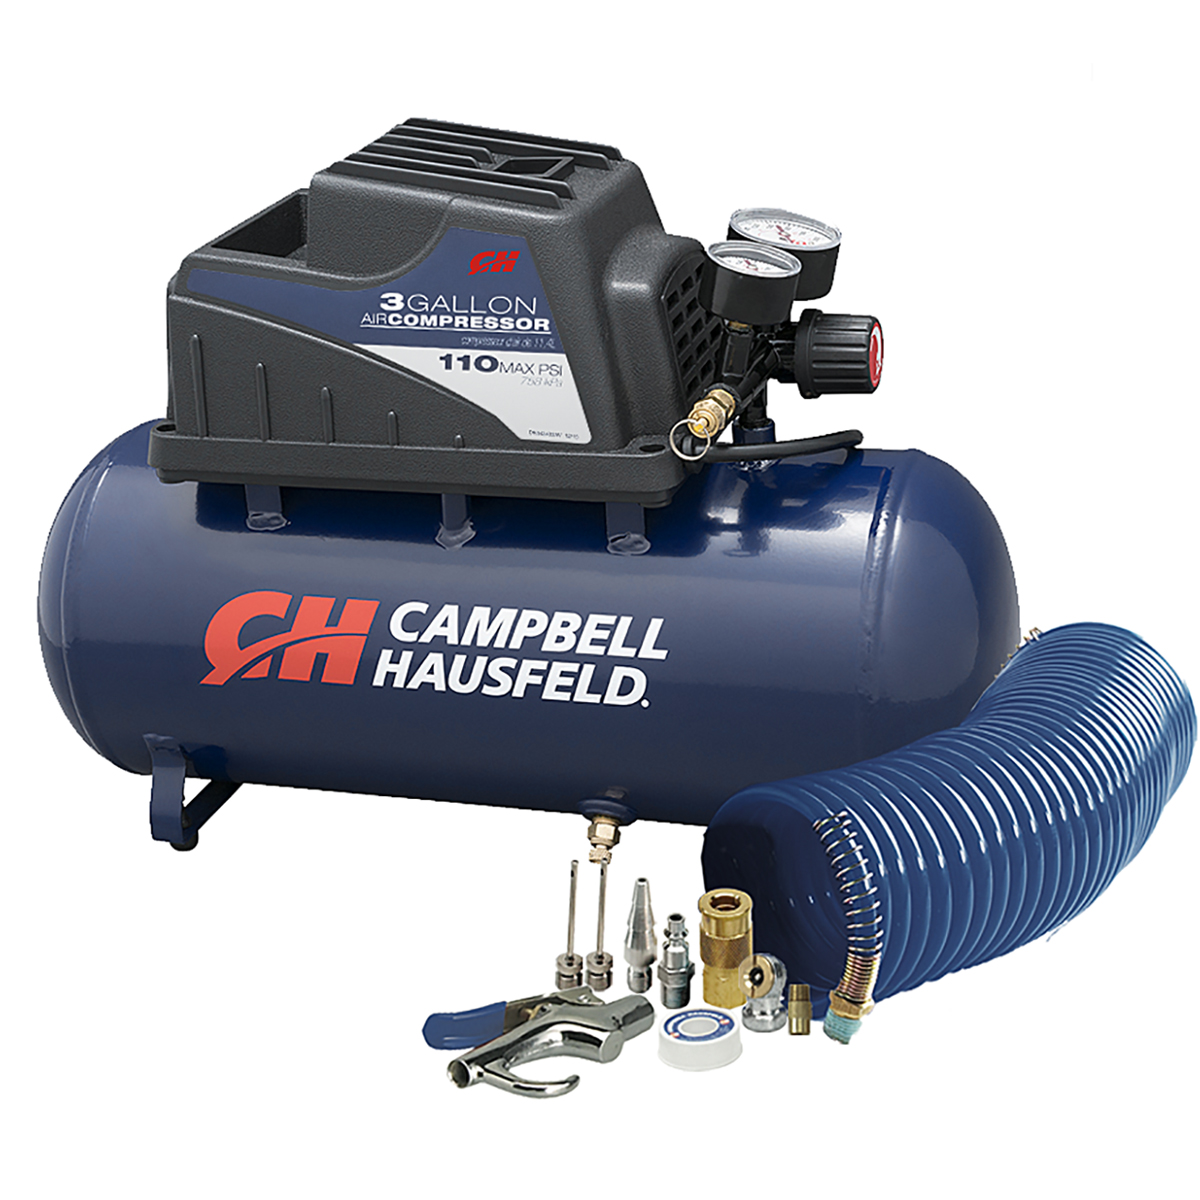 25 Piece Air Compressor Accessory Tool Kit 50 feet Hose Storage Case Tire Gauge